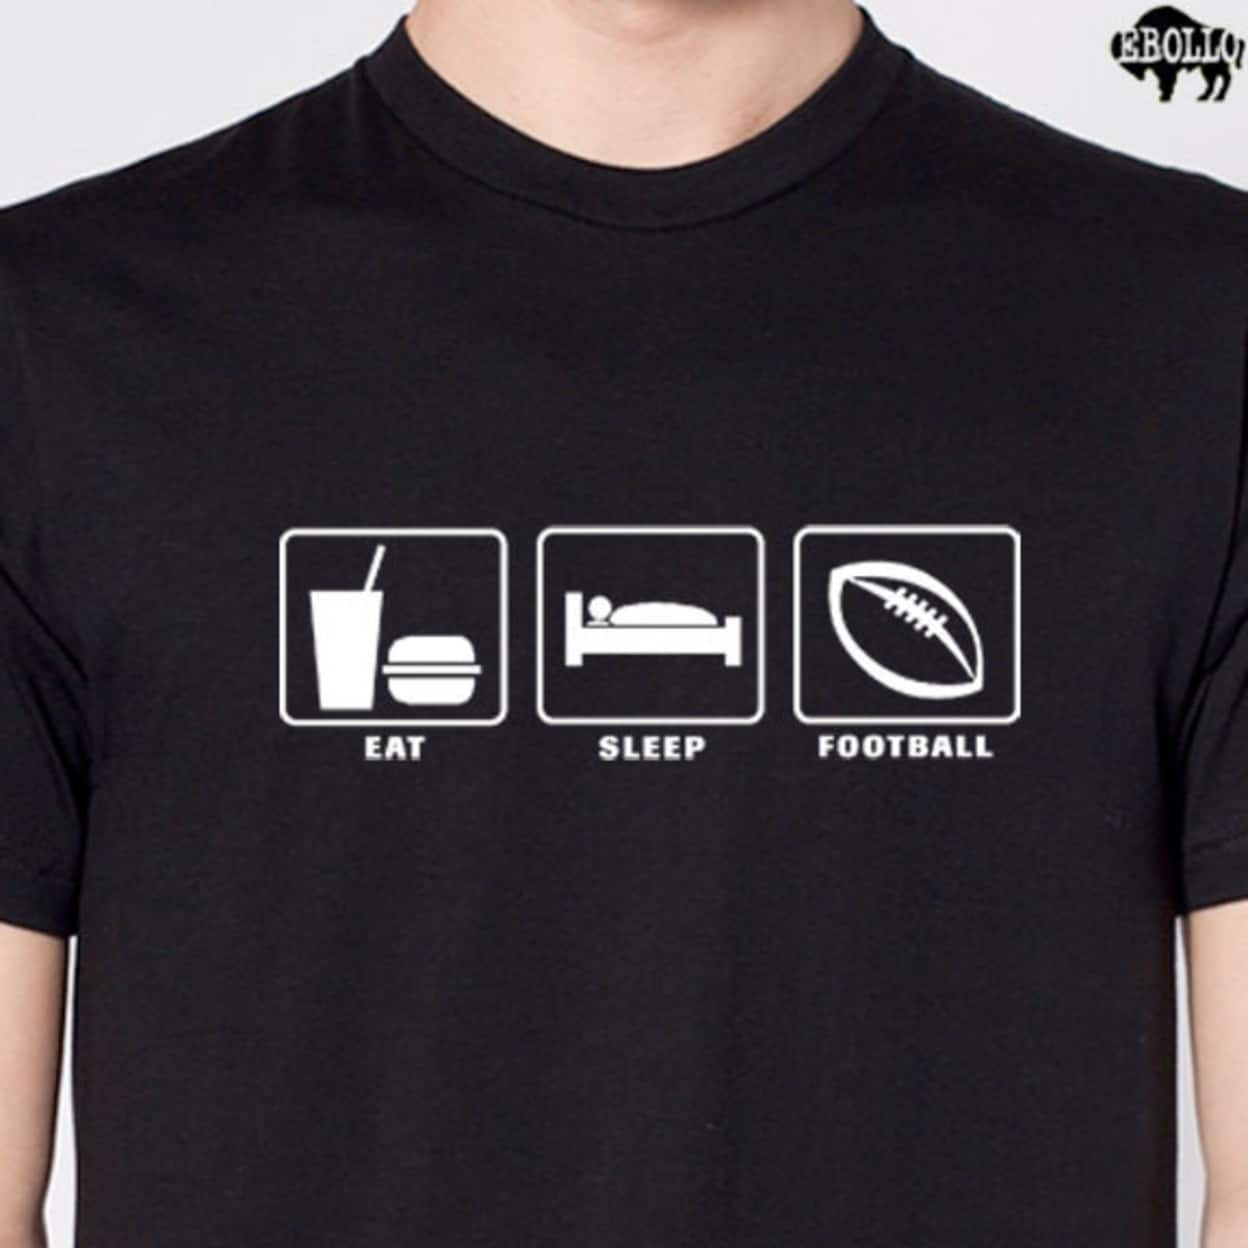 Eat Sleep Football Men's Cool T-Shirt Design Funny Tees Sports Tee